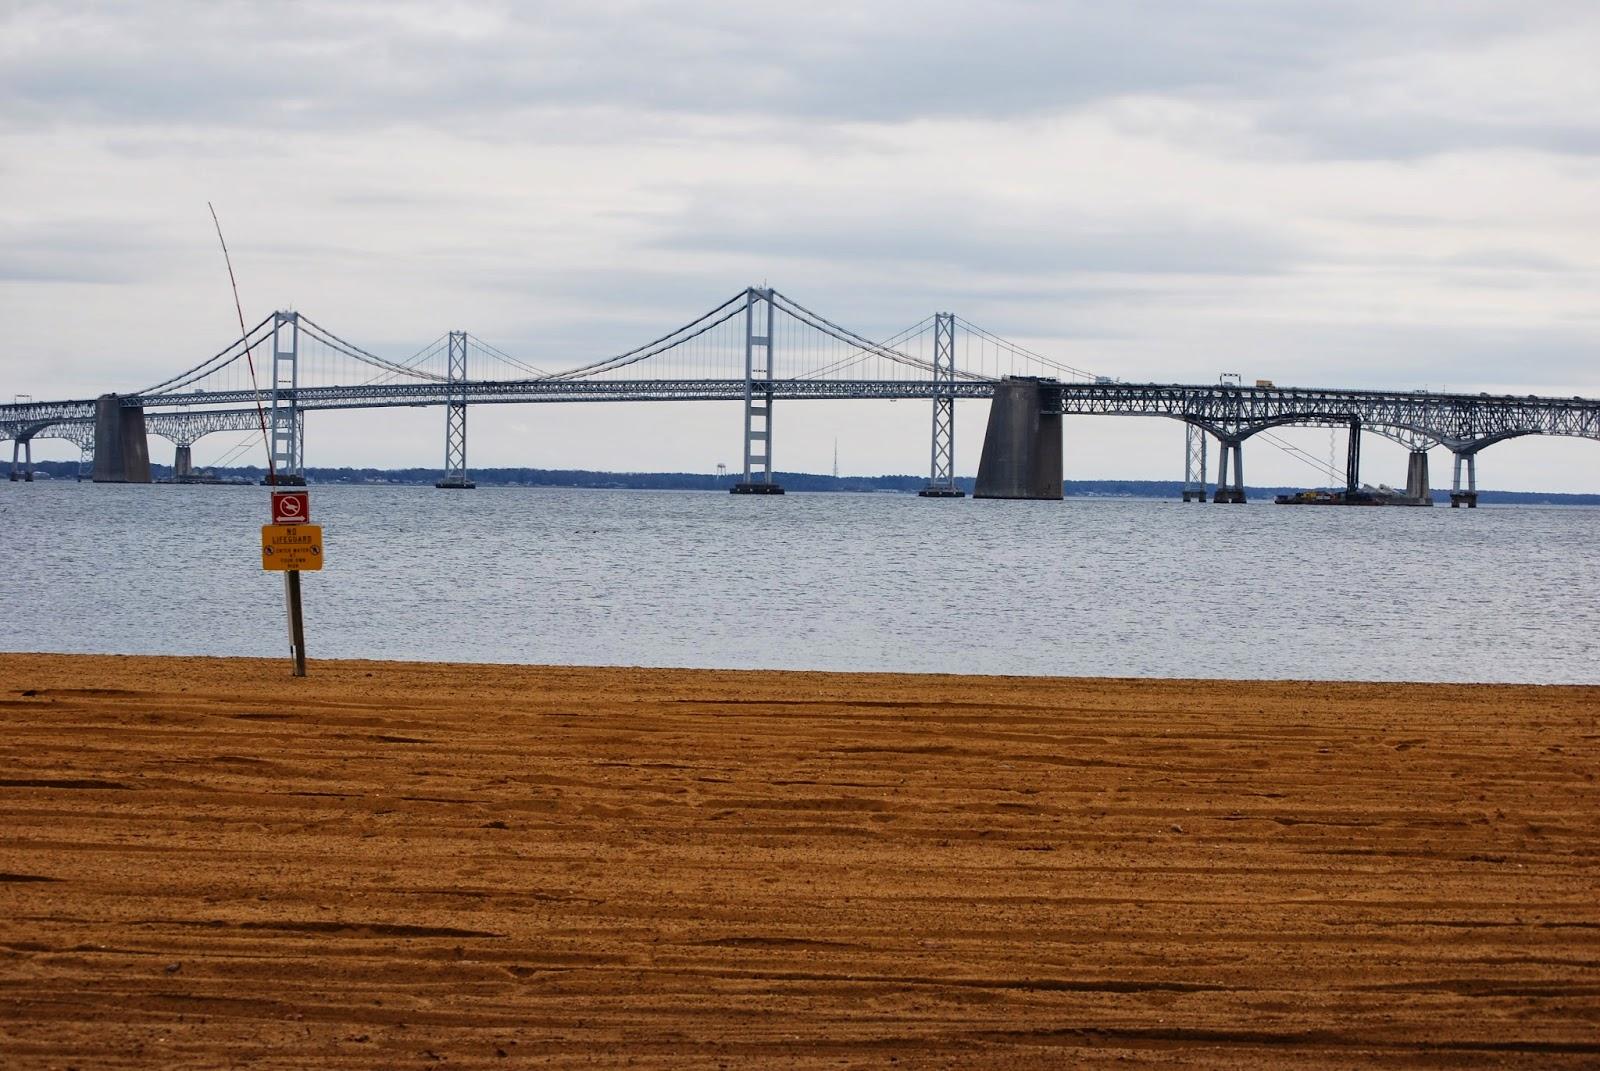 Vote no 39 malley sandy point fishing report for Chesapeake bay bridge fishing report